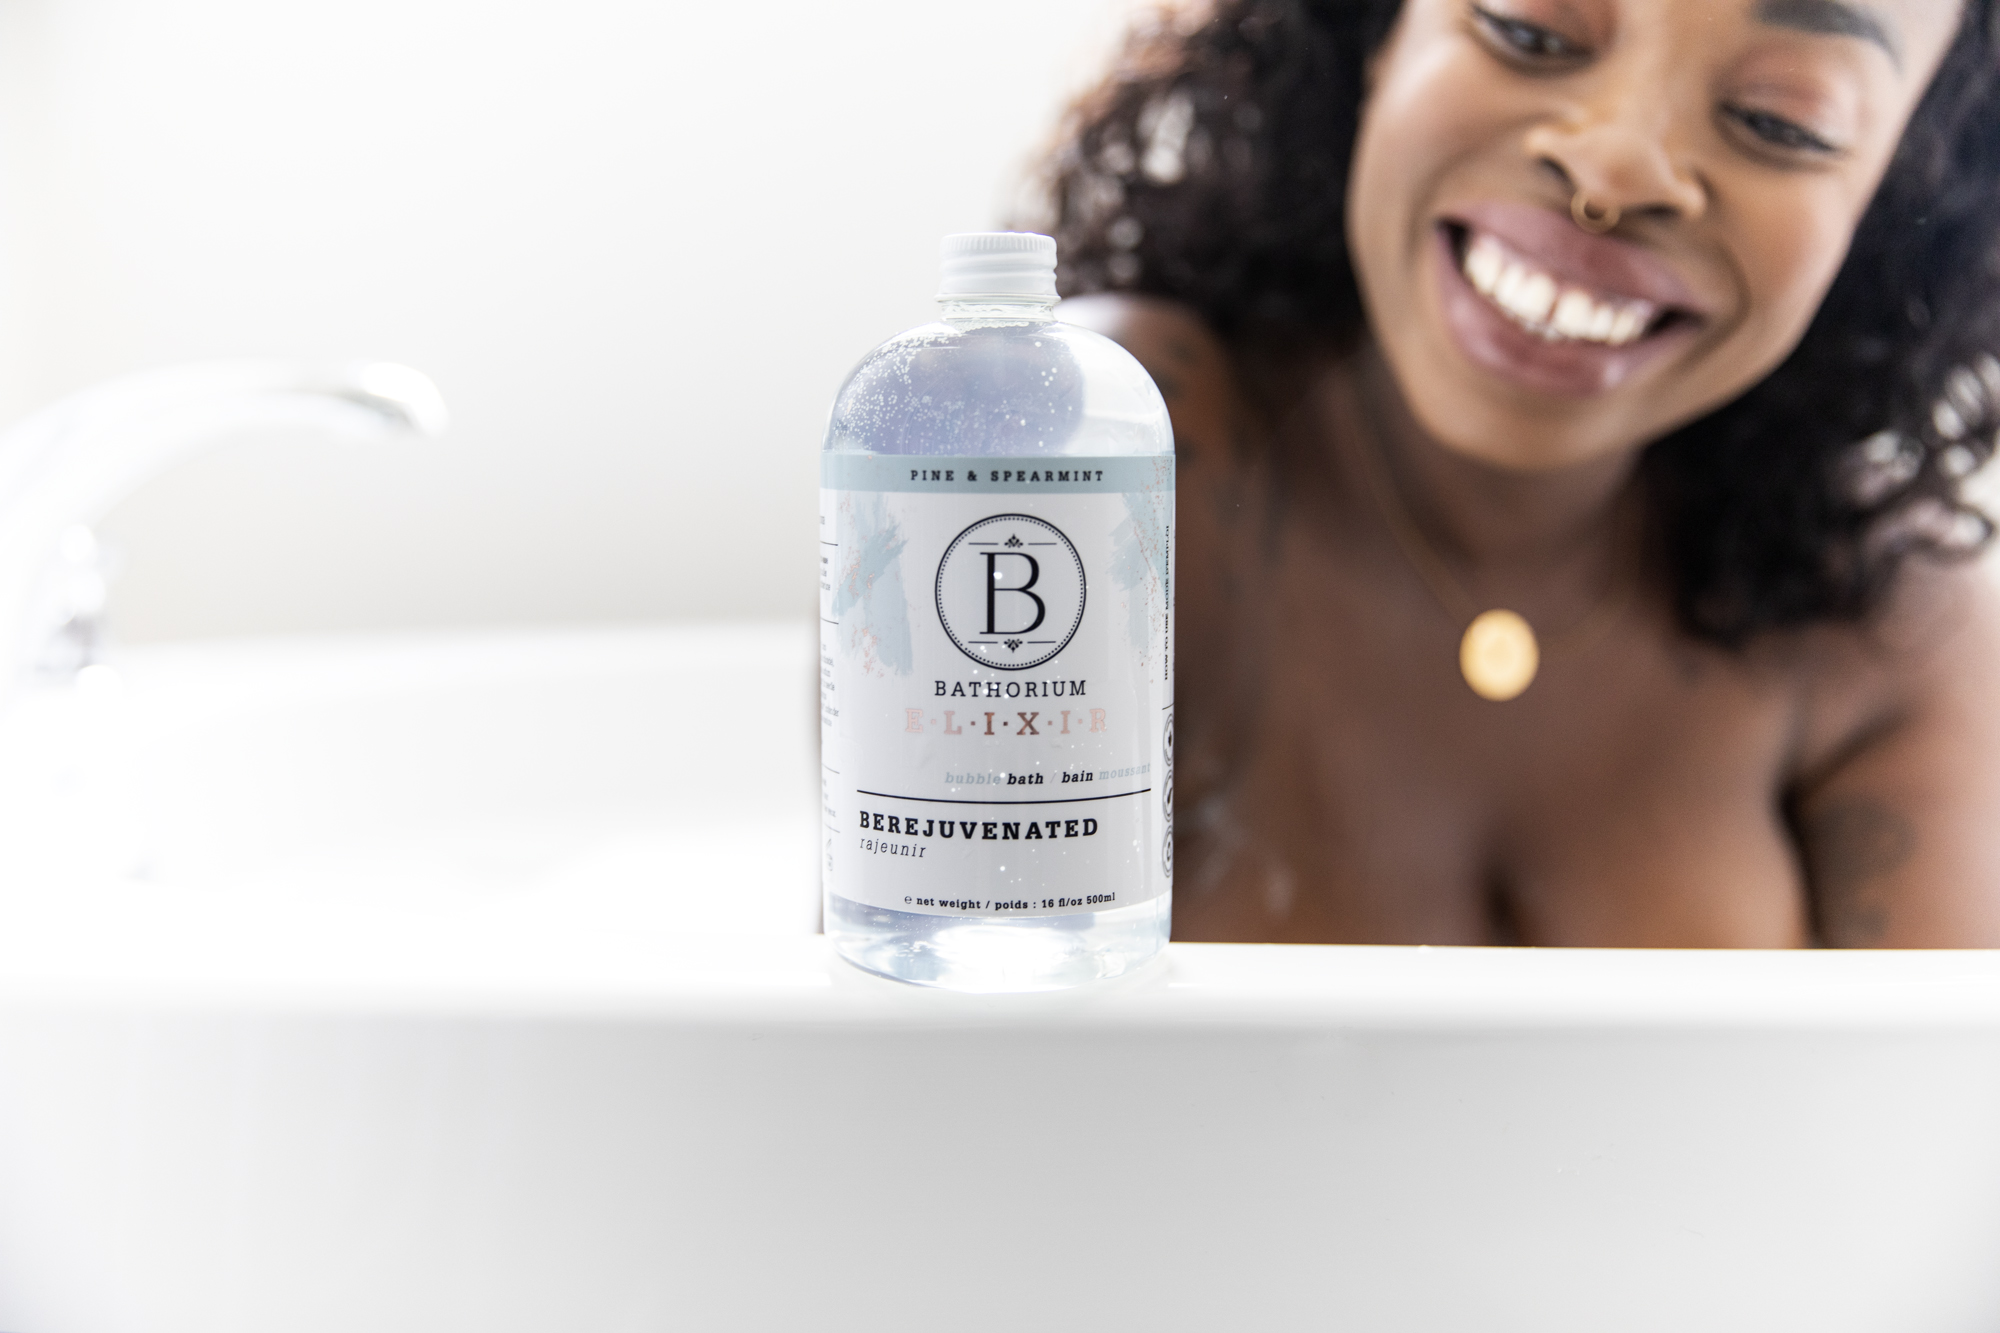 Bathorium BeRejuvenated Bubble bath on the ledge of the tub